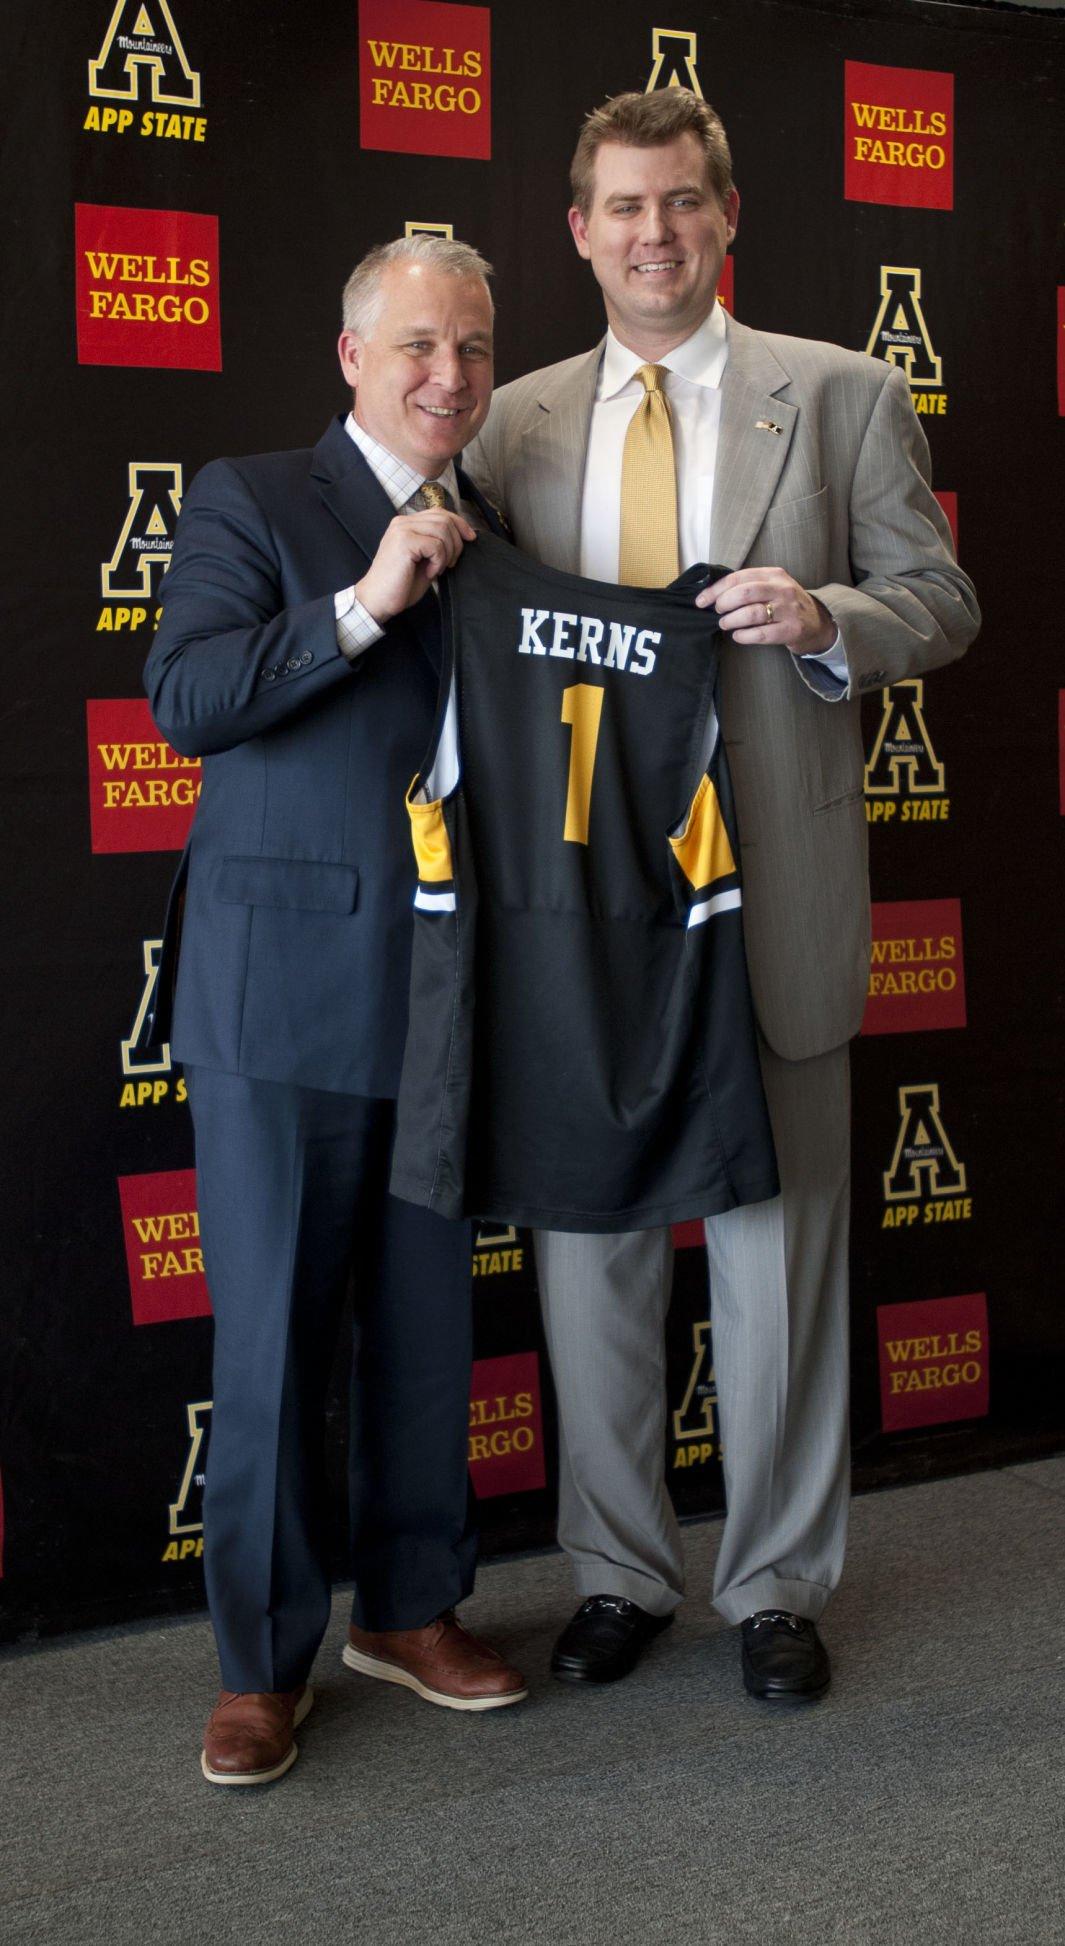 Dustin Kerns press conference